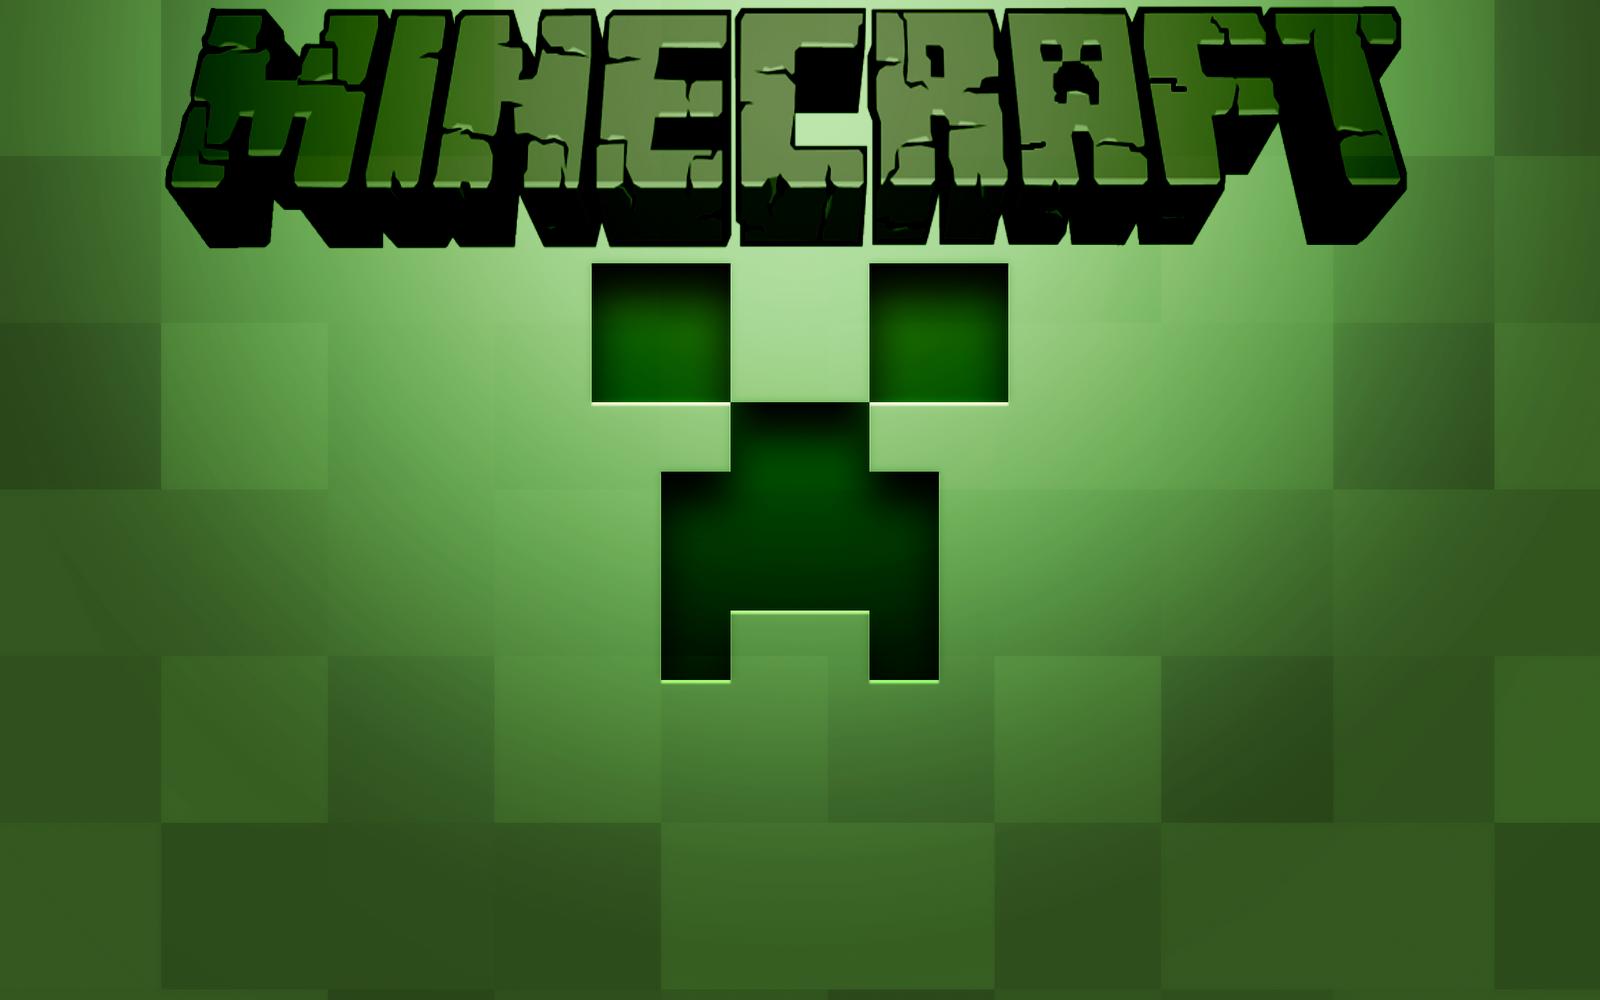 Simple Wallpaper Minecraft Square - latest?cb\u003d20140401032559  Trends_359219.png/revision/latest?cb\u003d20140401032559